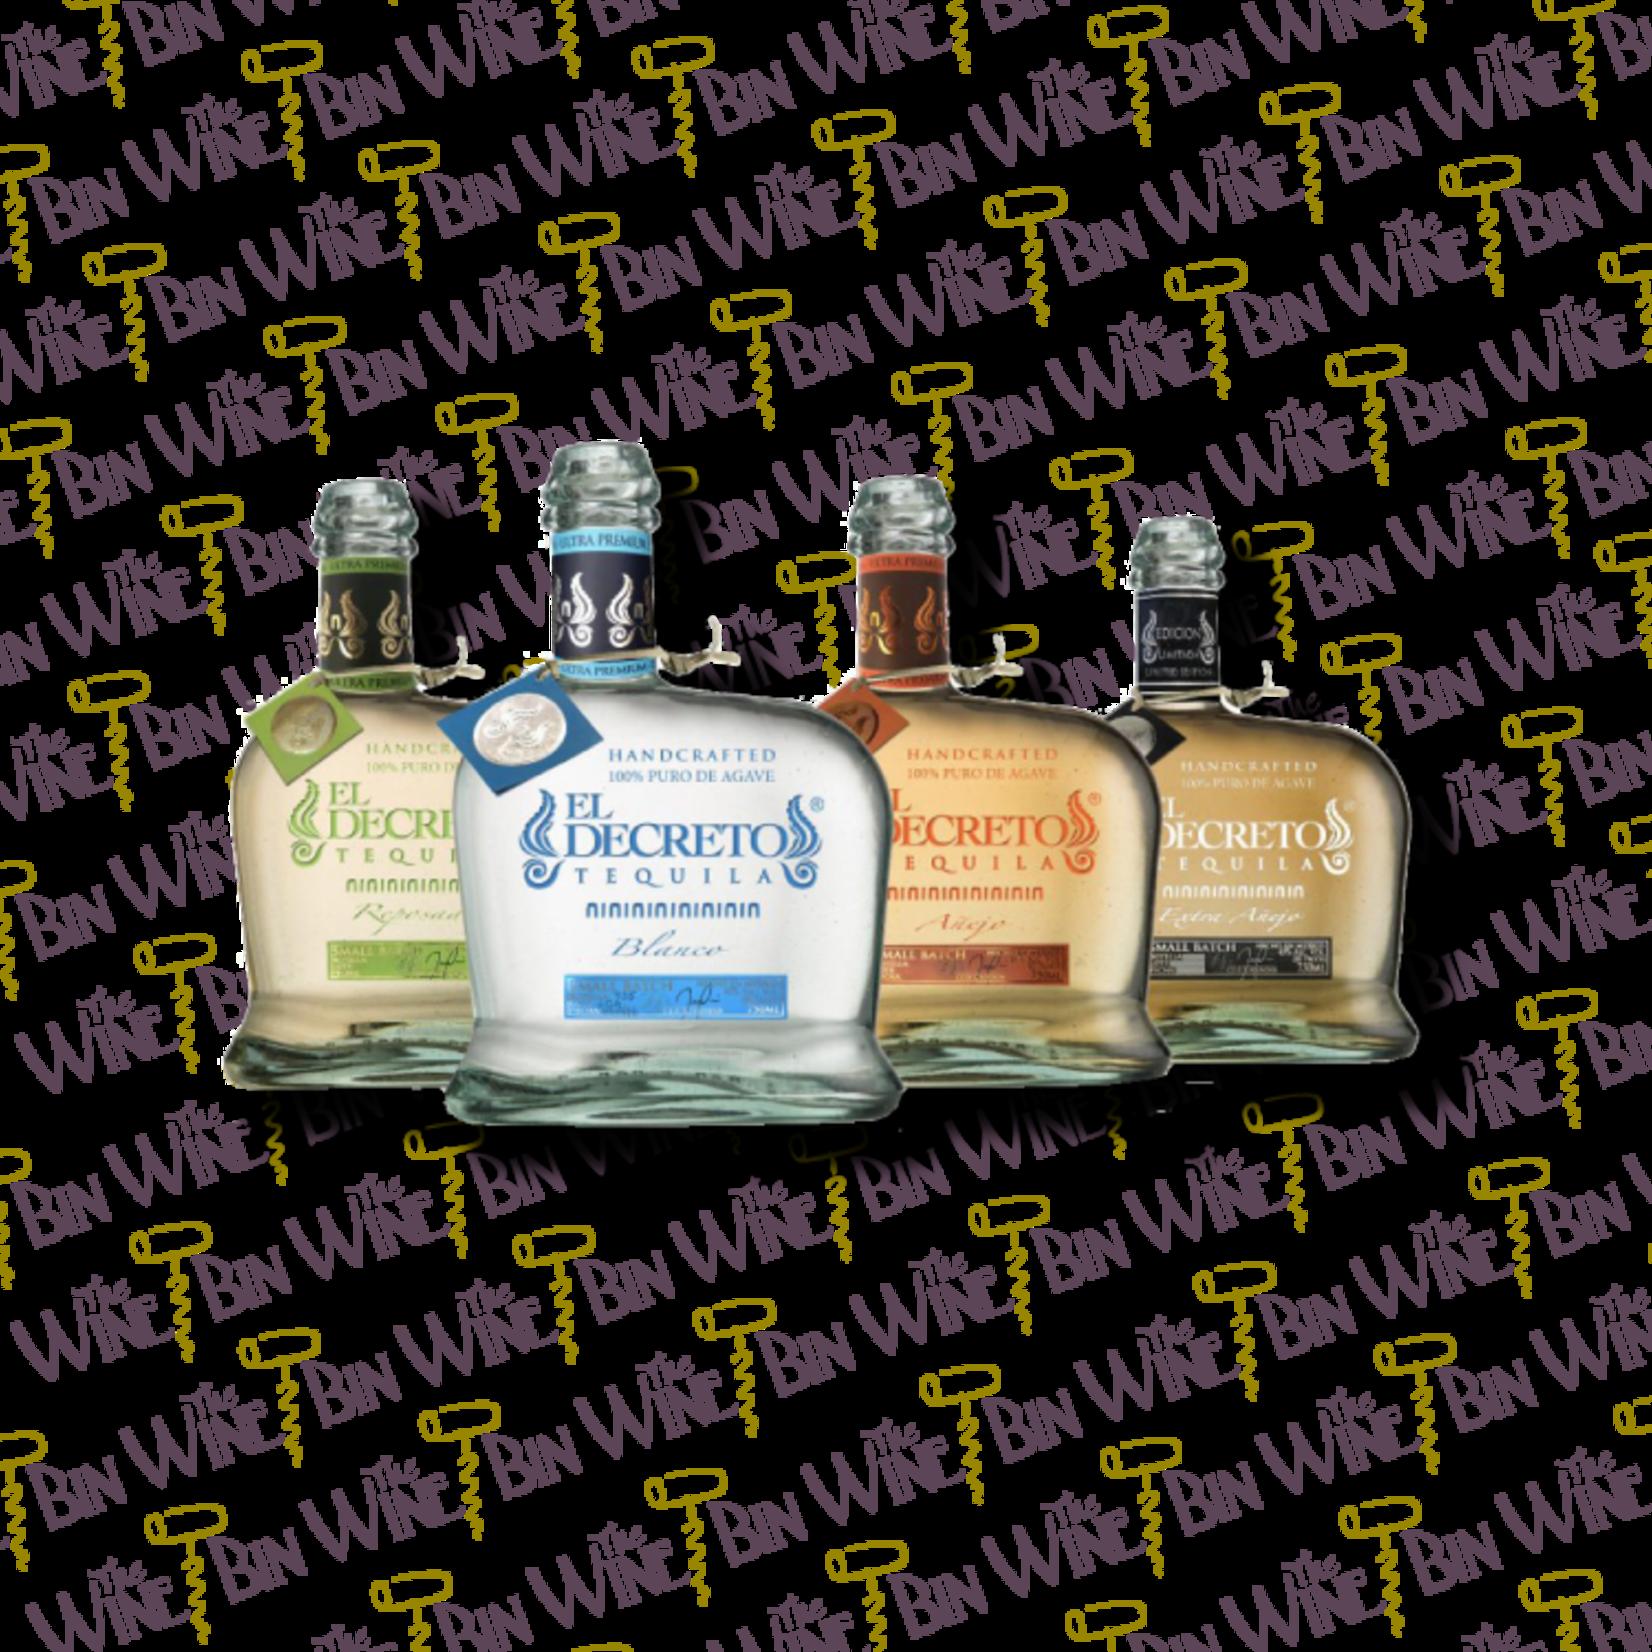 El Decreto El Decreto Tequila .750L